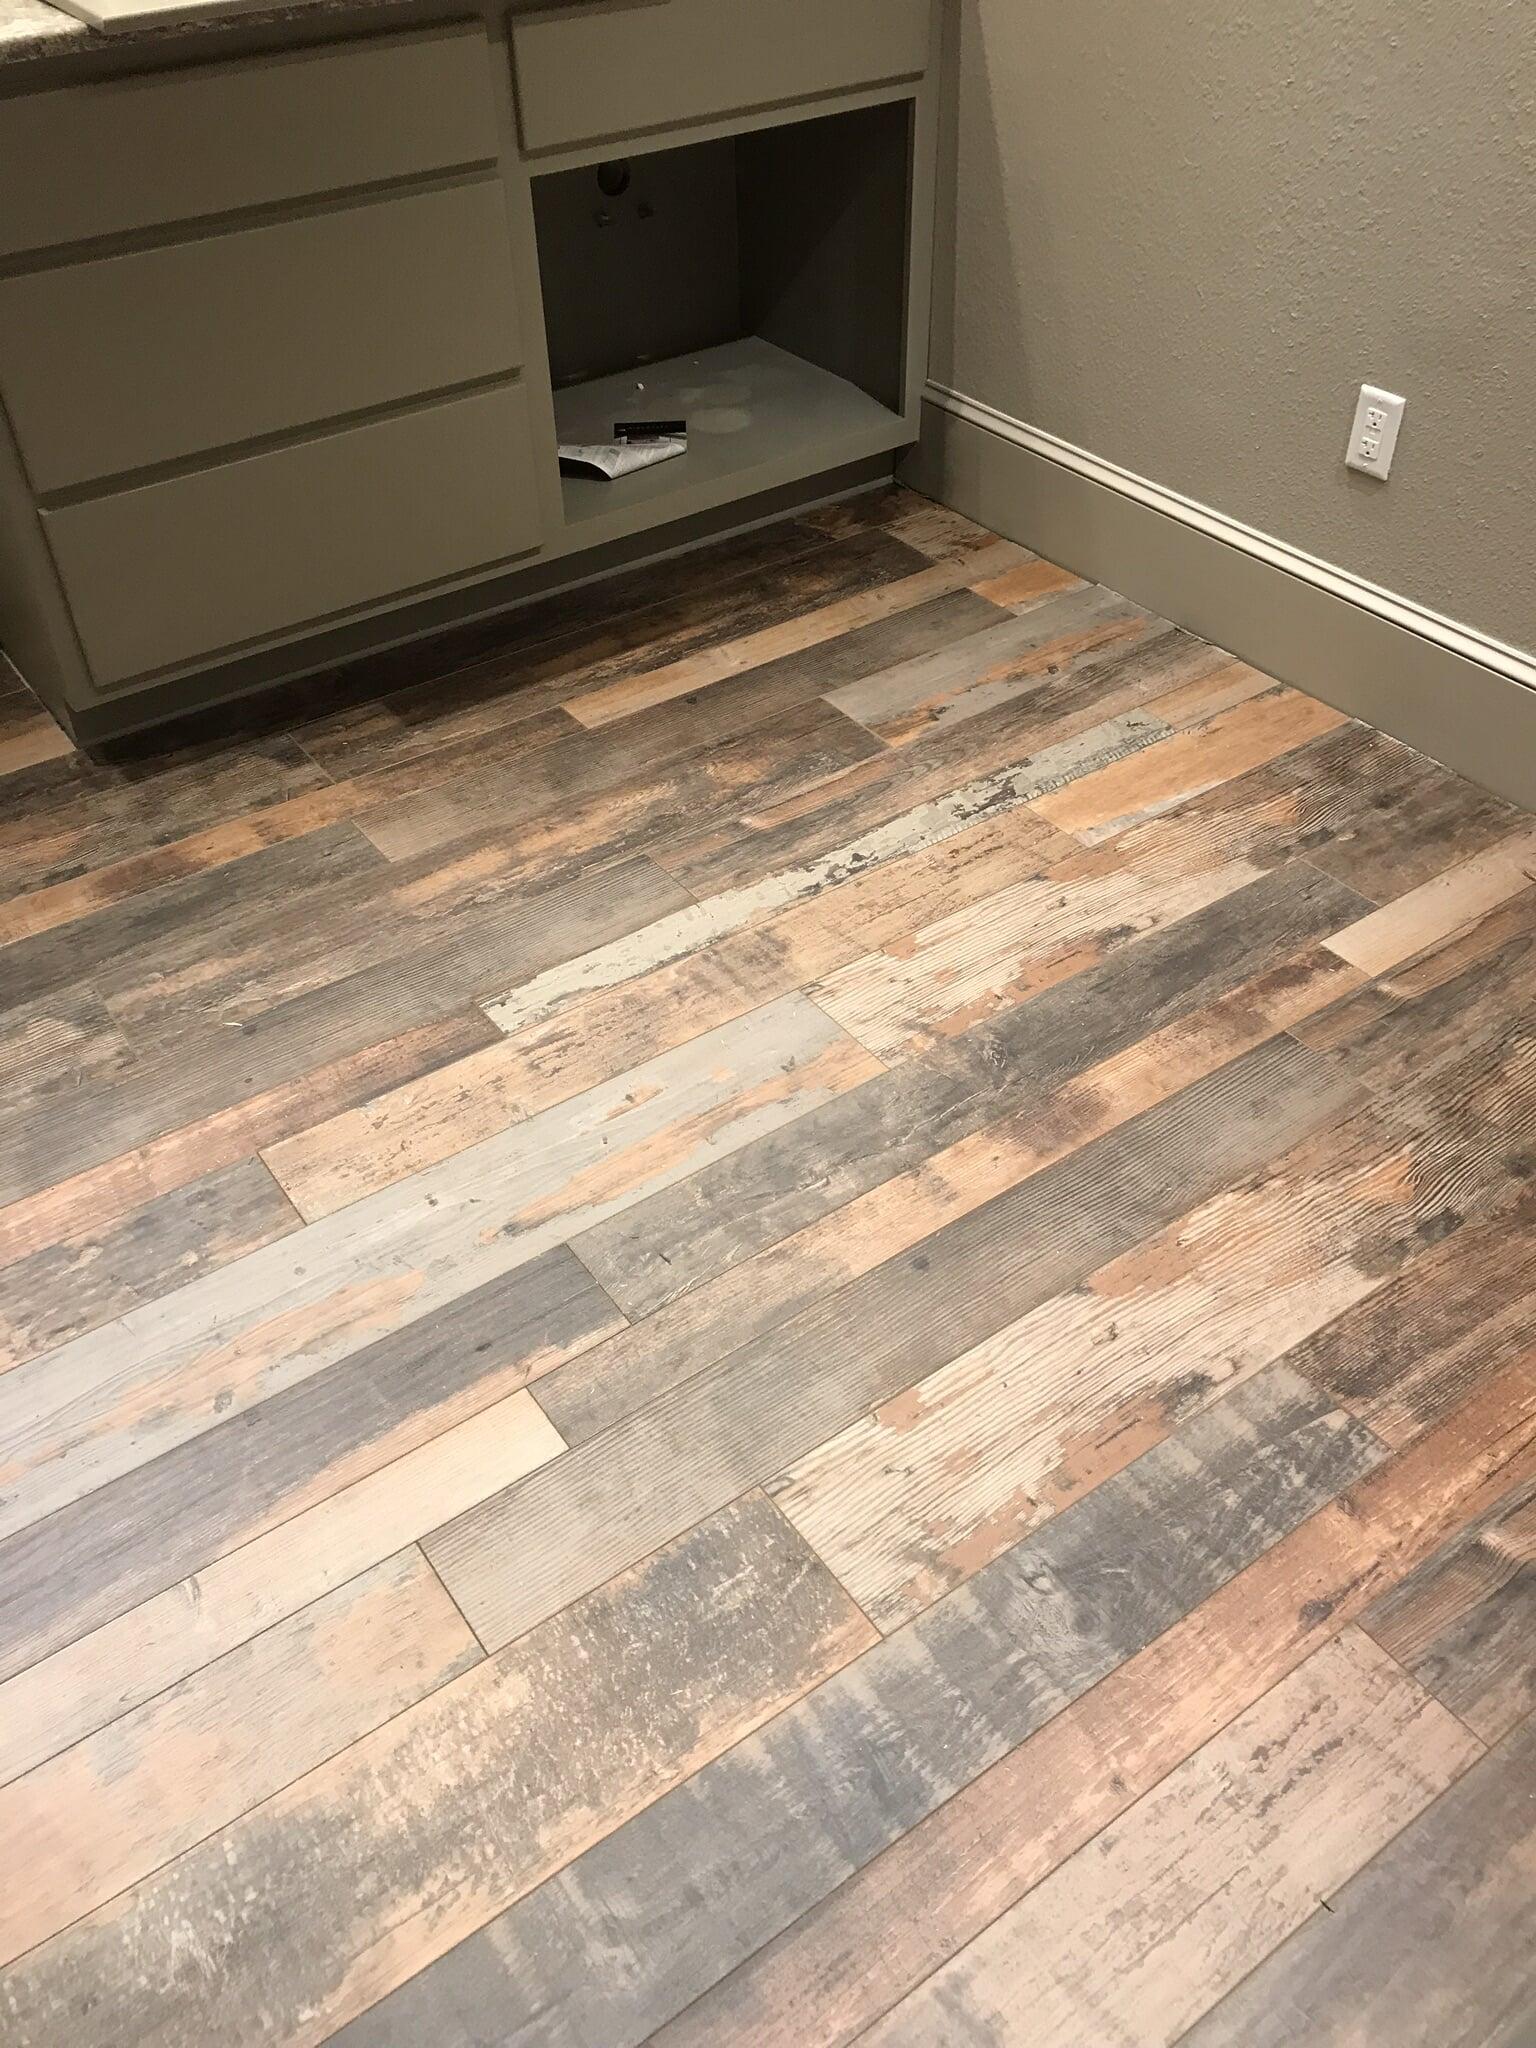 Hardwood from Roop's Carpet in Bald Knob, AR